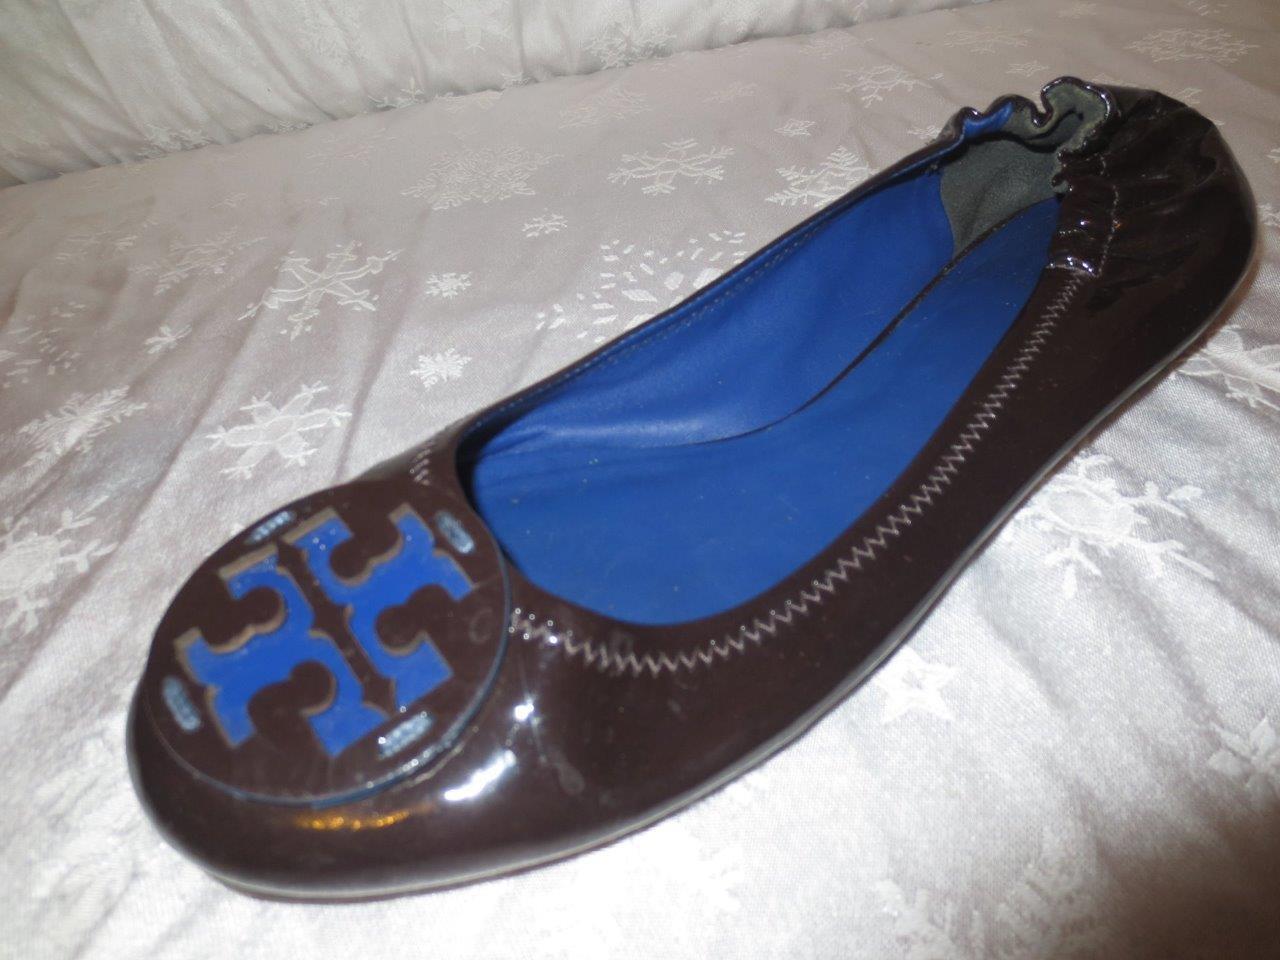 TORY BURCH Damenschuhe COCONUT BROWN & Blau Reva PATENT LEATHER Ballet Flats Schuhe 10